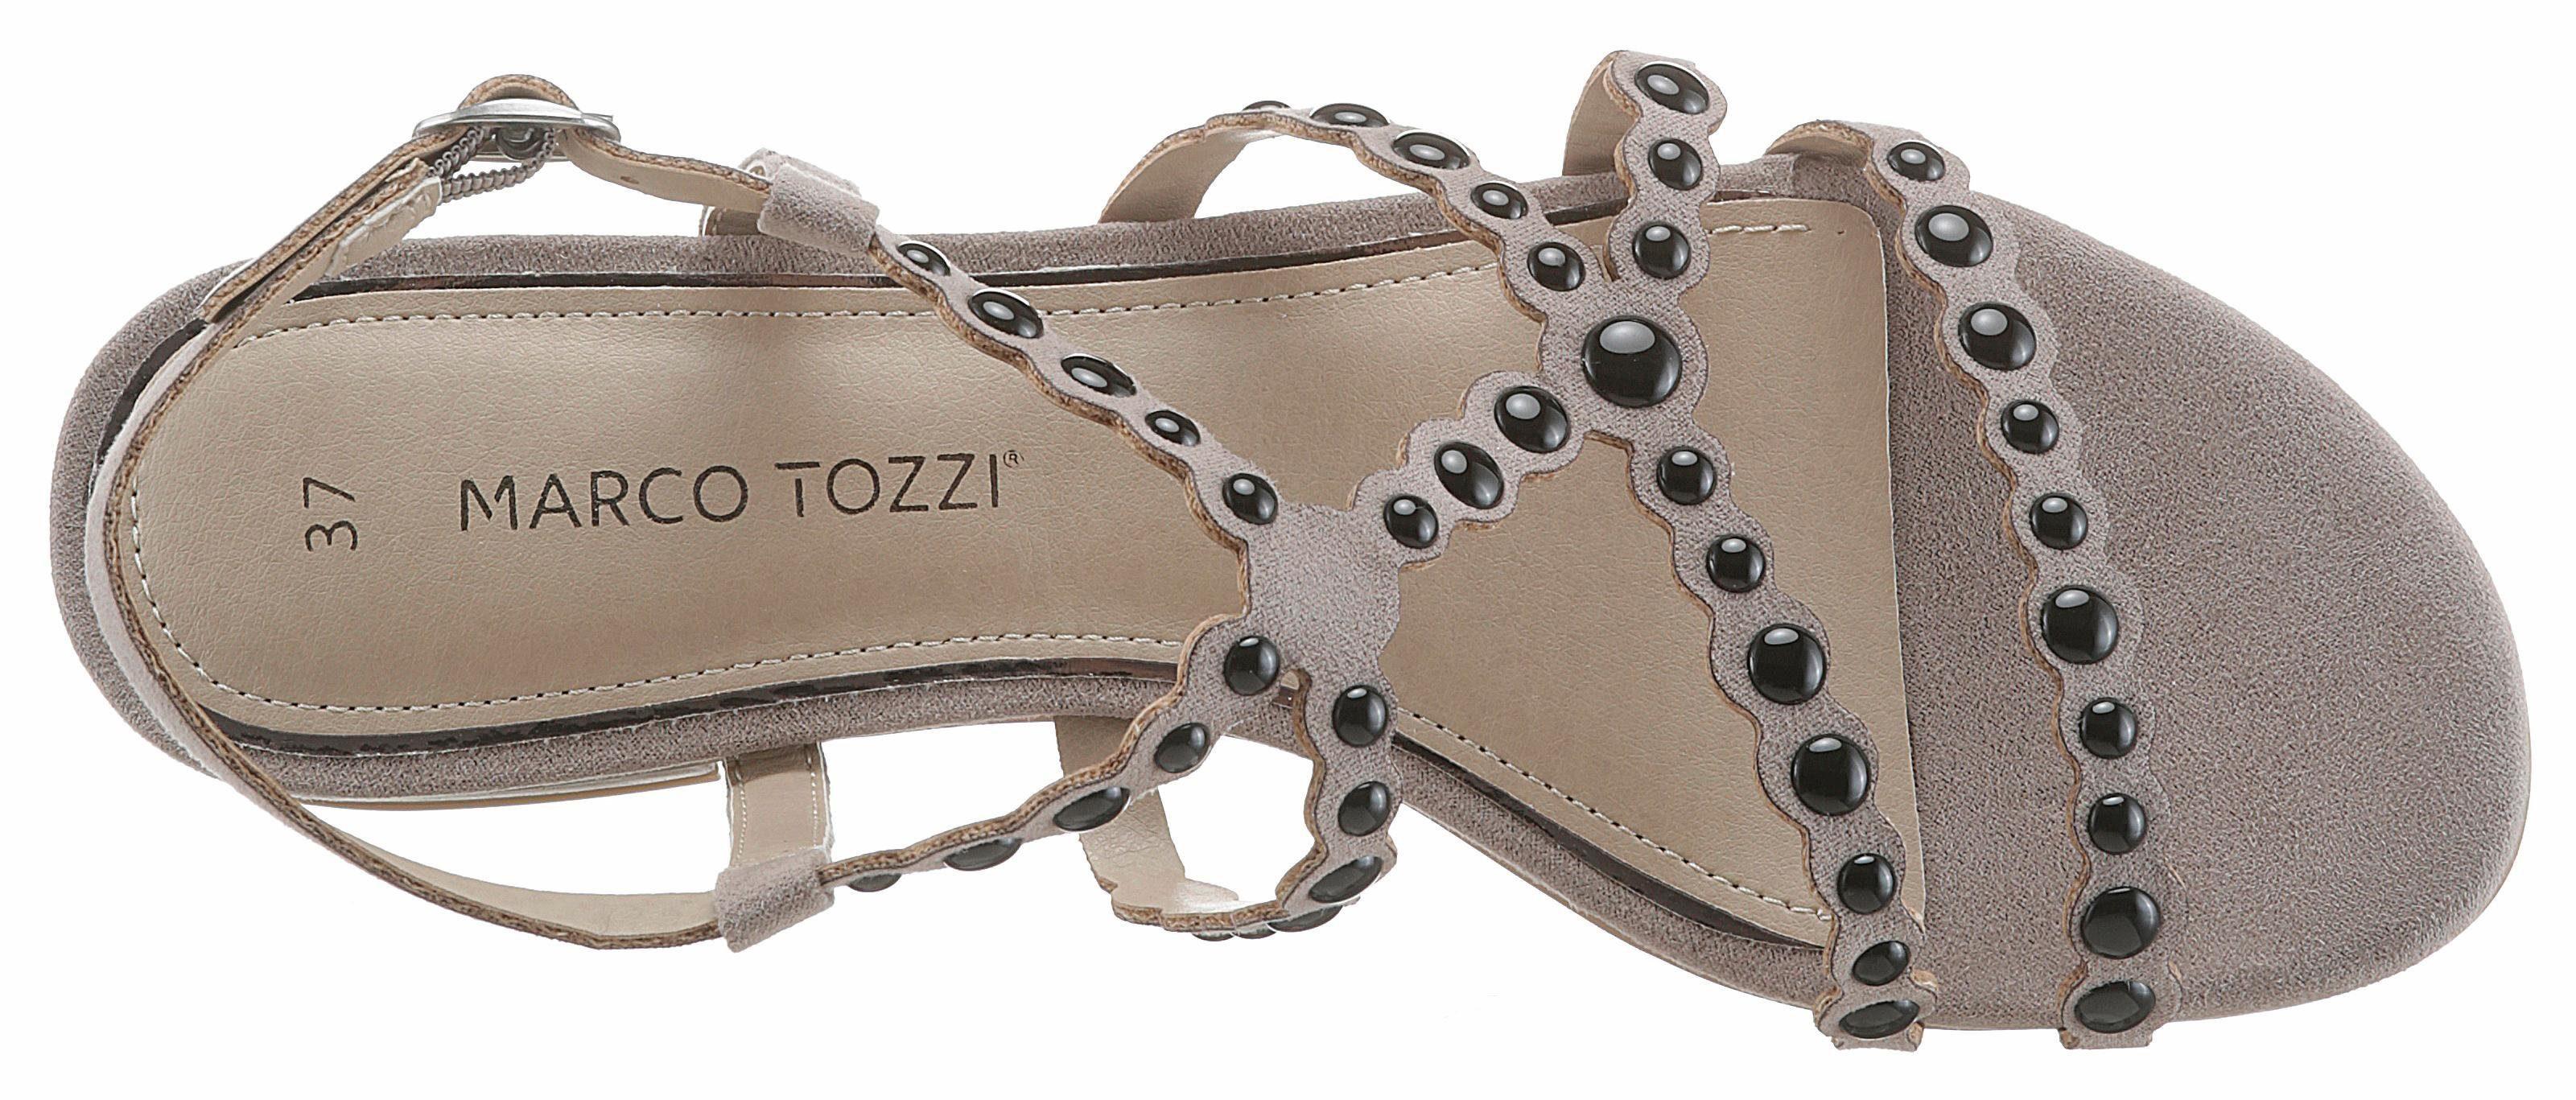 Marco Tozzi Riemchensandalette, mit markanten Nieten online kaufen  taupe